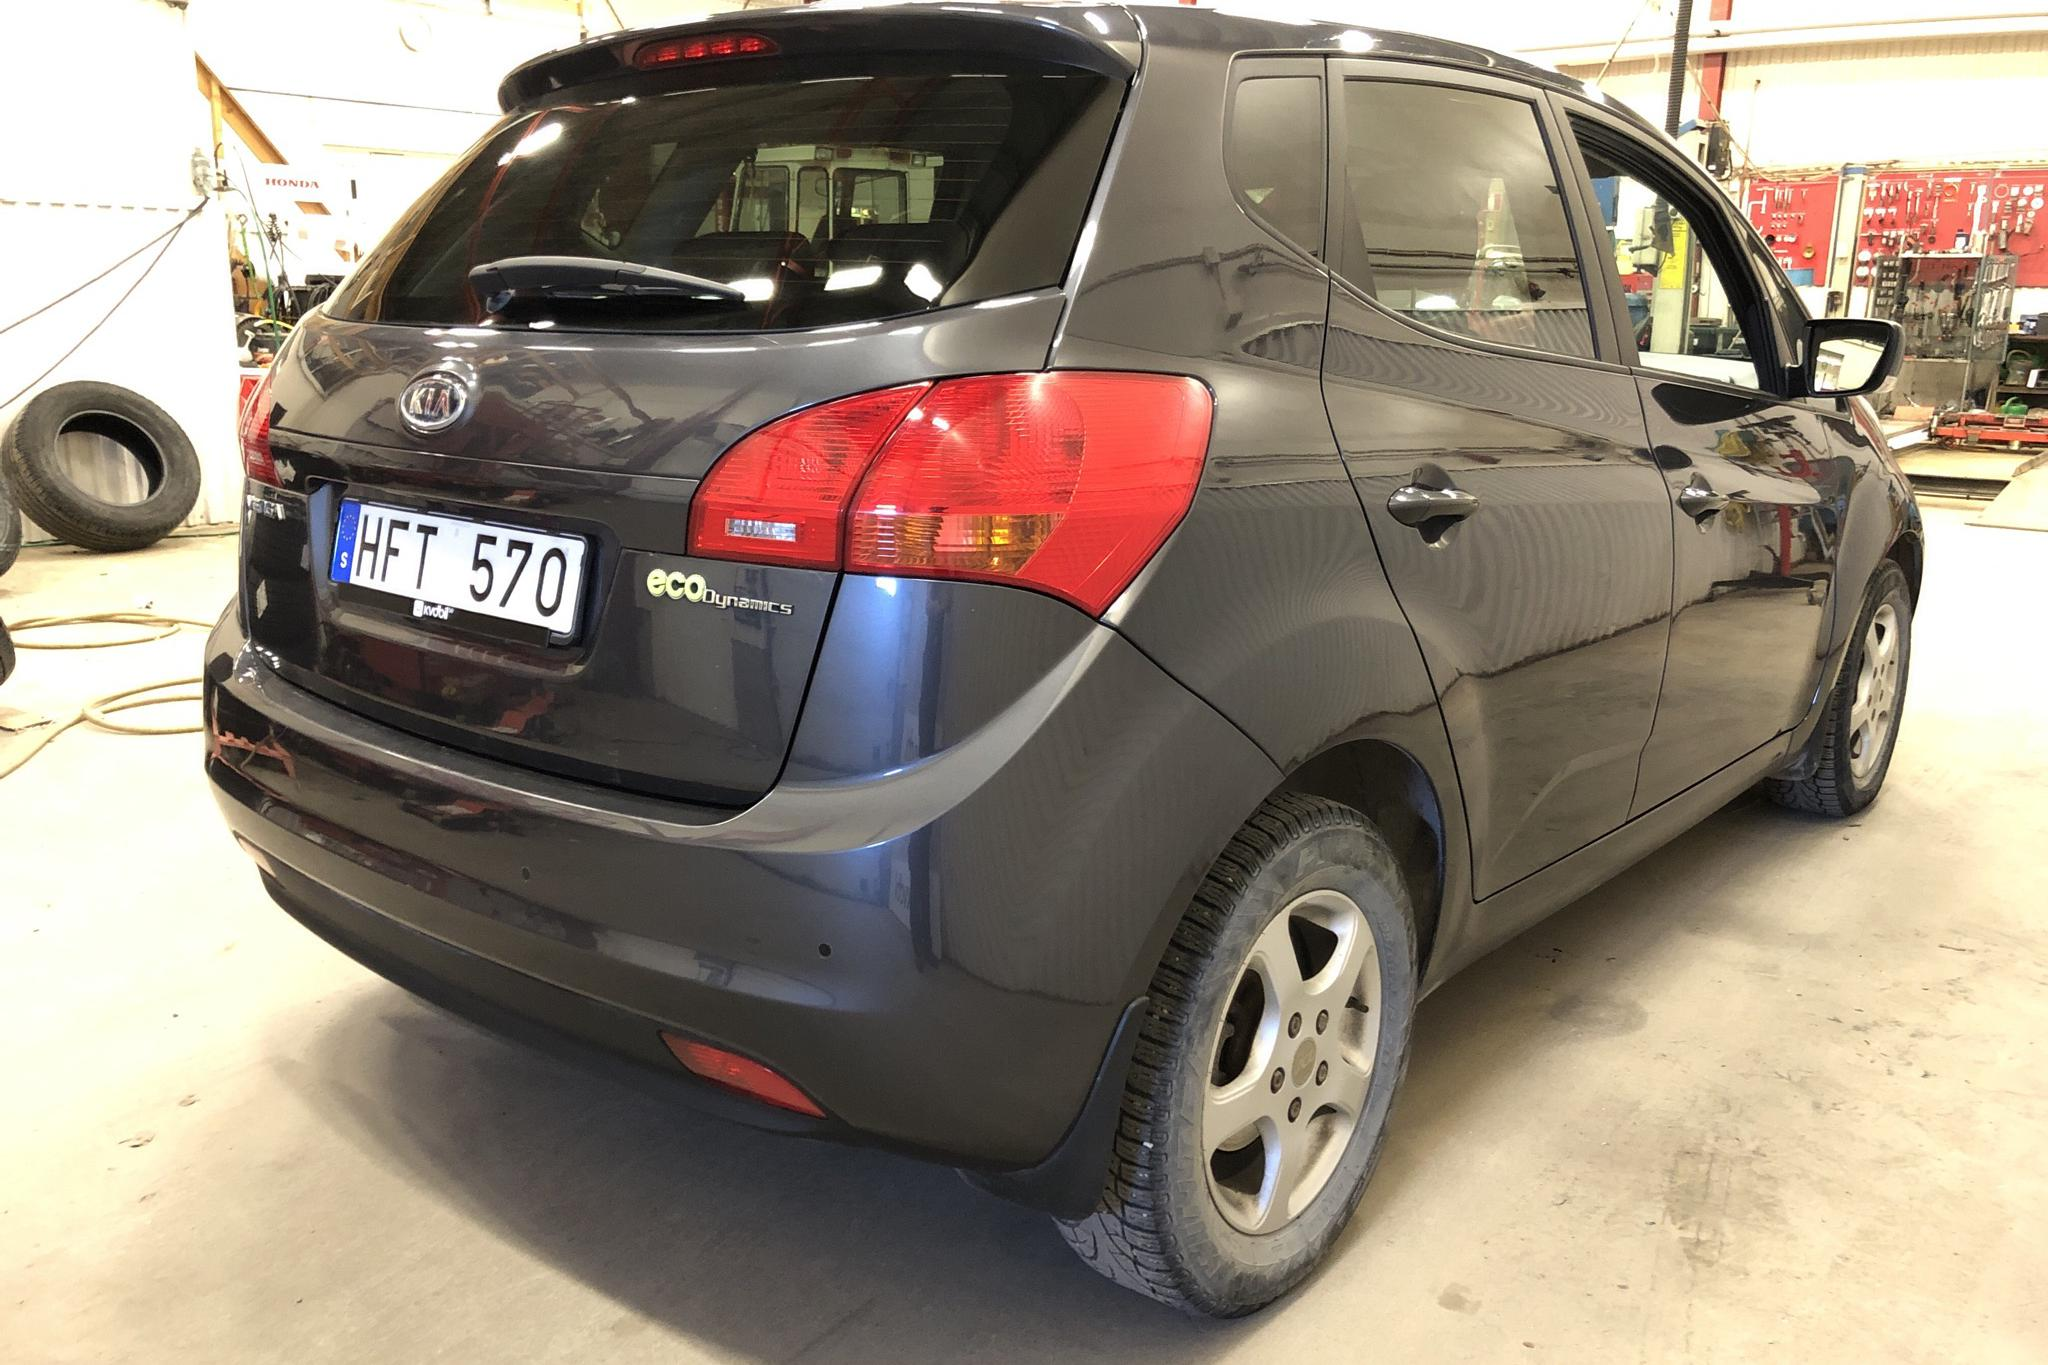 KIA Venga 1.4 CRDi (90hk) - 137 230 km - Manual - Dark Grey - 2013